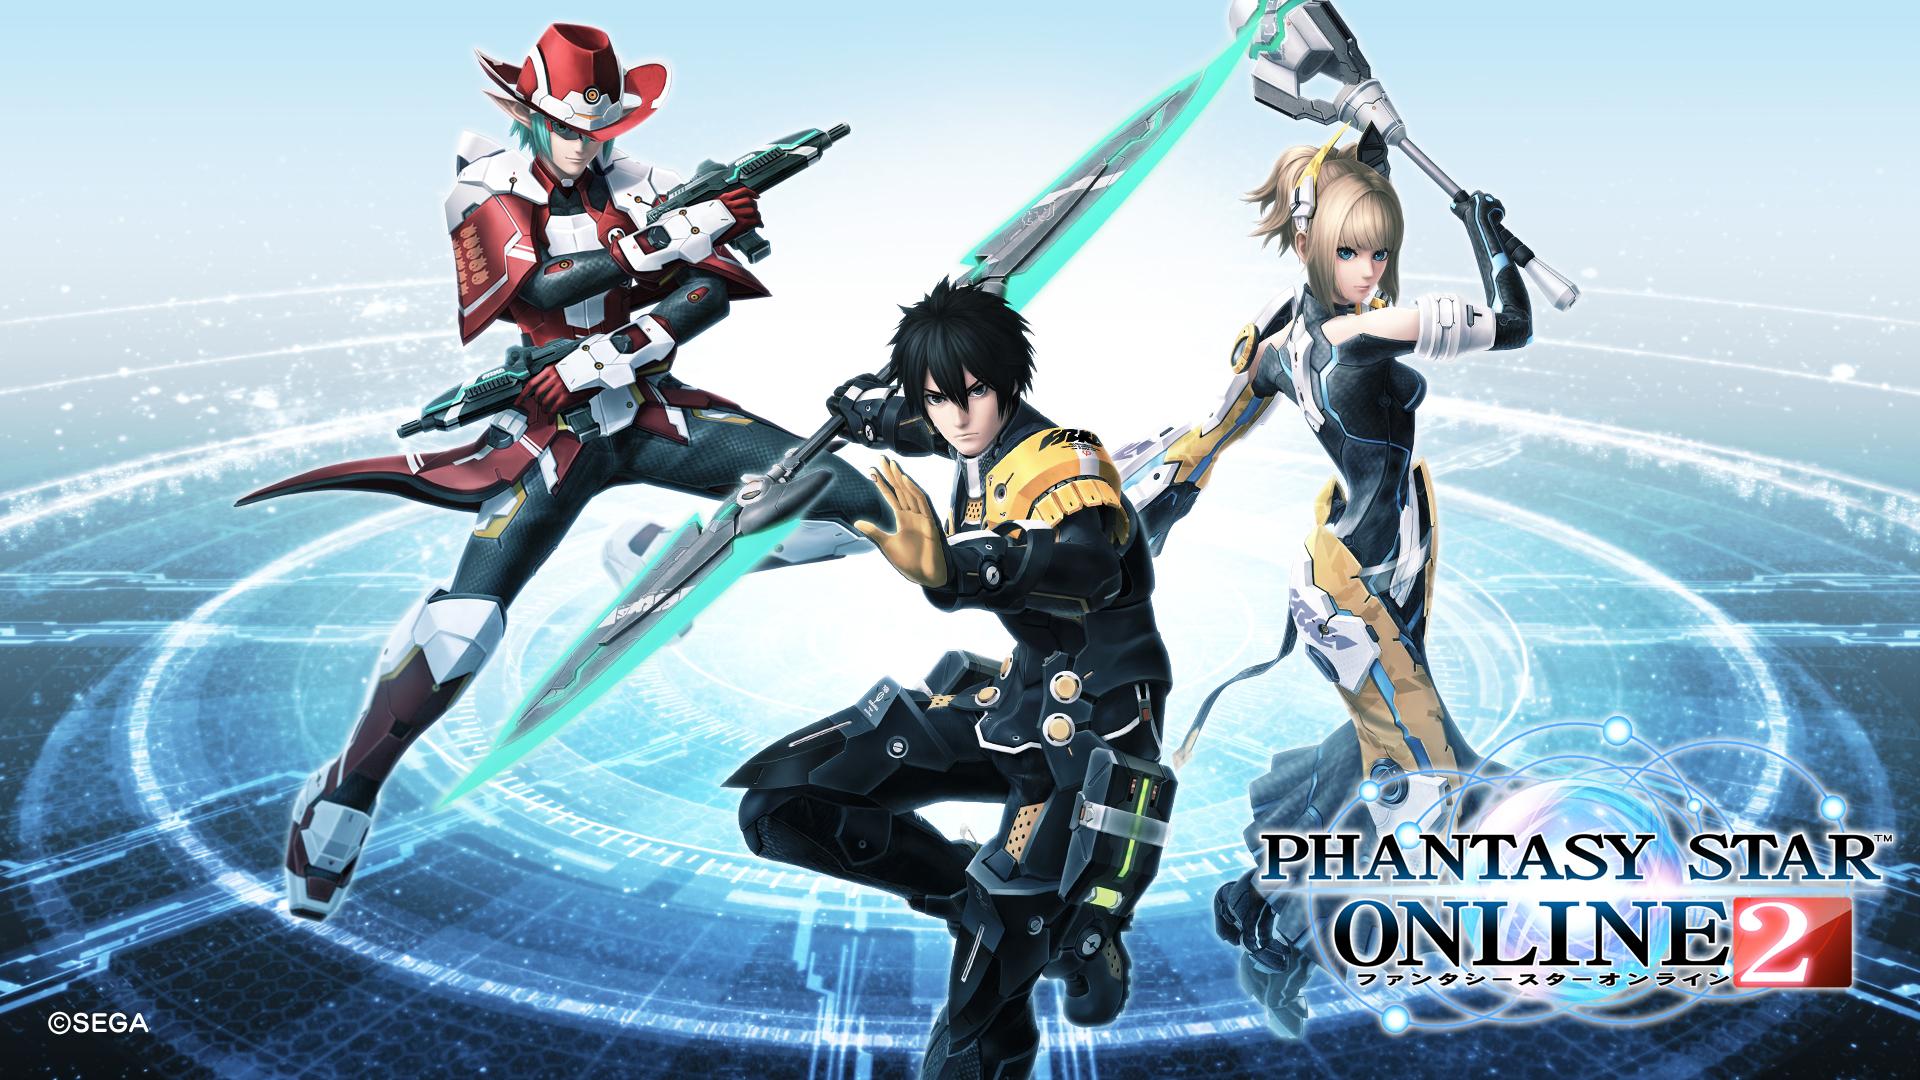 E3 2019   بازی Phantasy Star Online 2 برای غرب منتشر میشود + تریلر